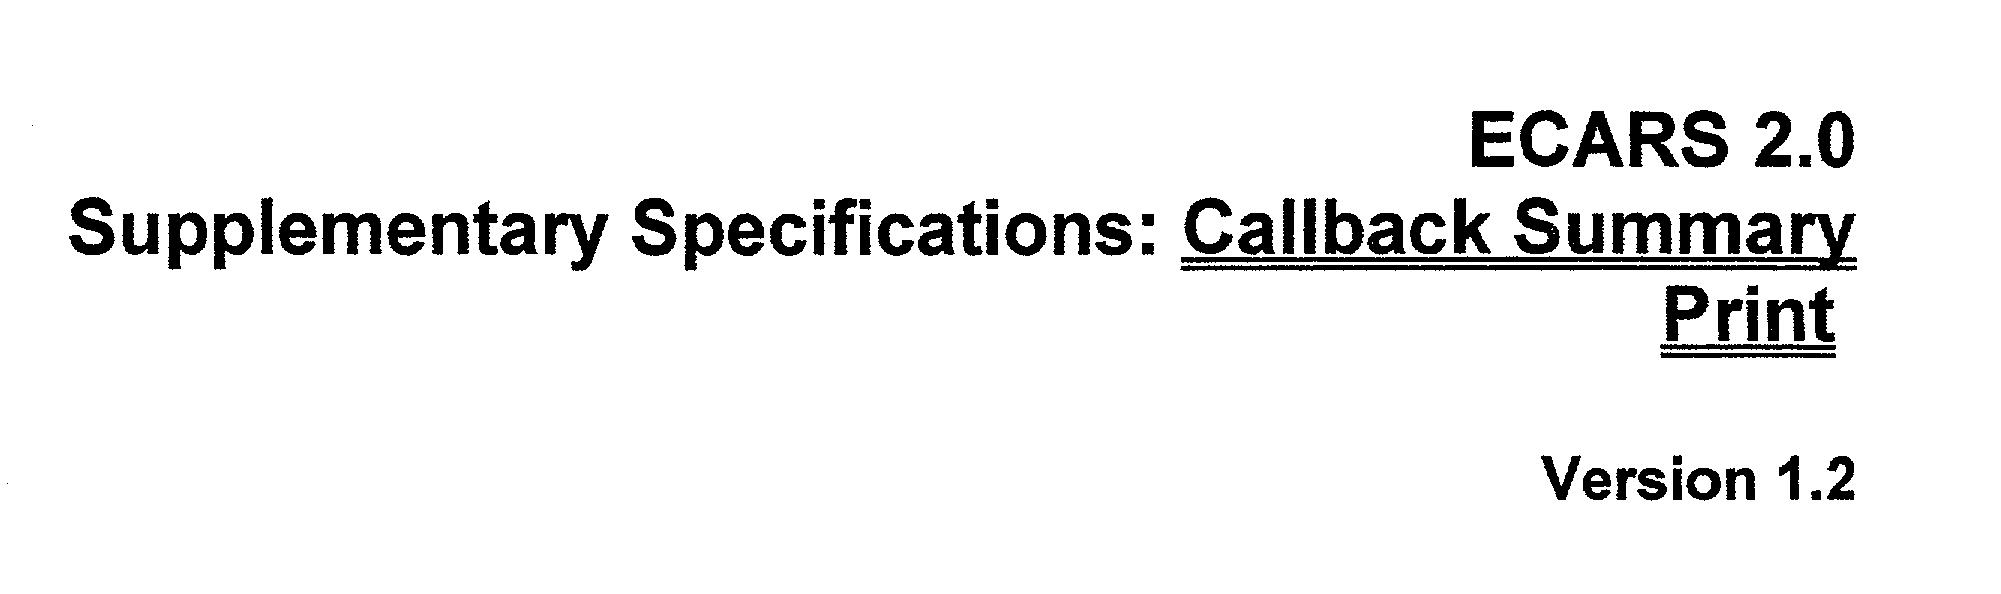 Figure US20030125992A1-20030703-P01452